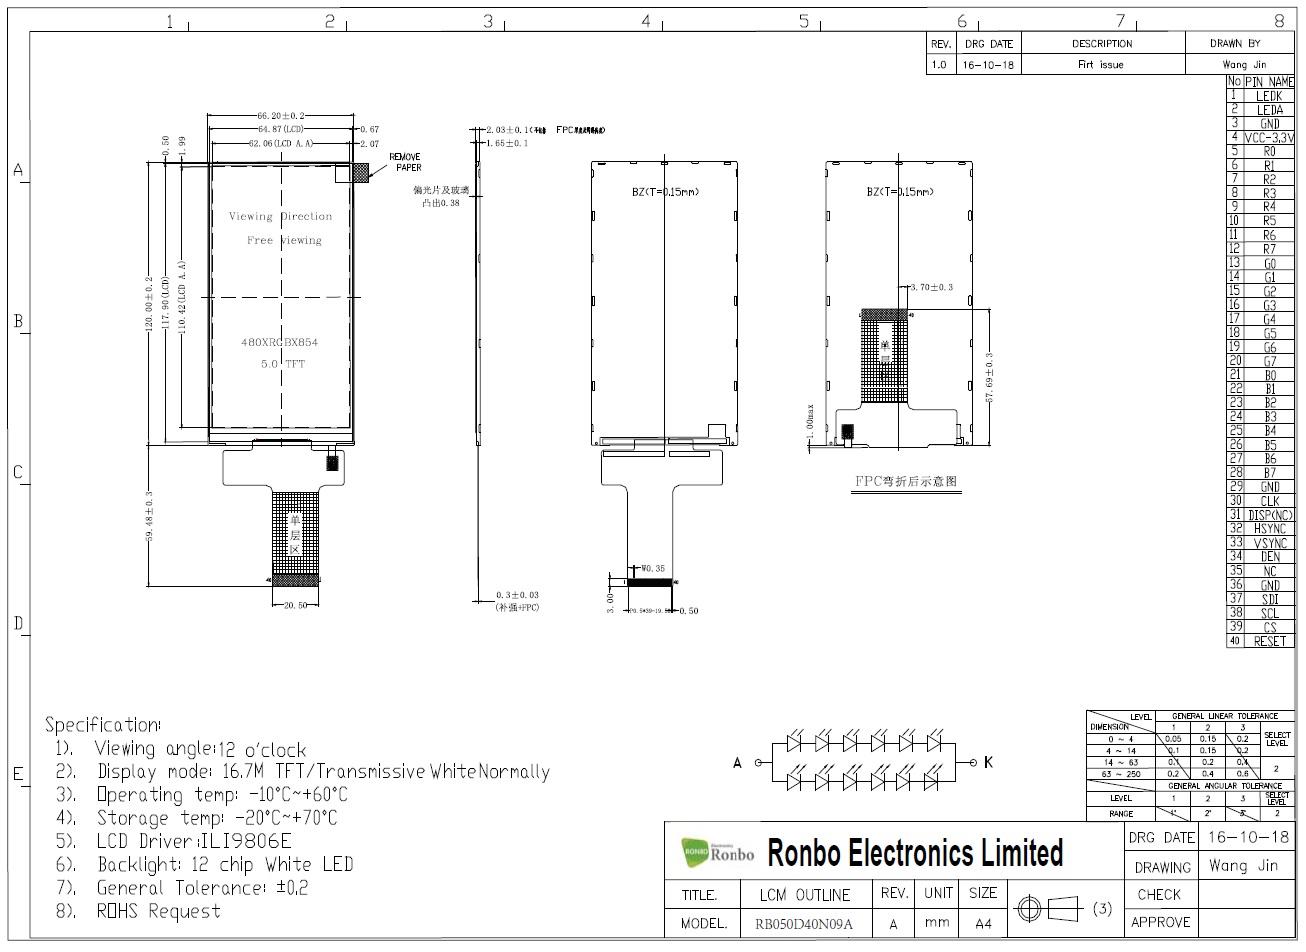 RB050D40N09A_03.jpg